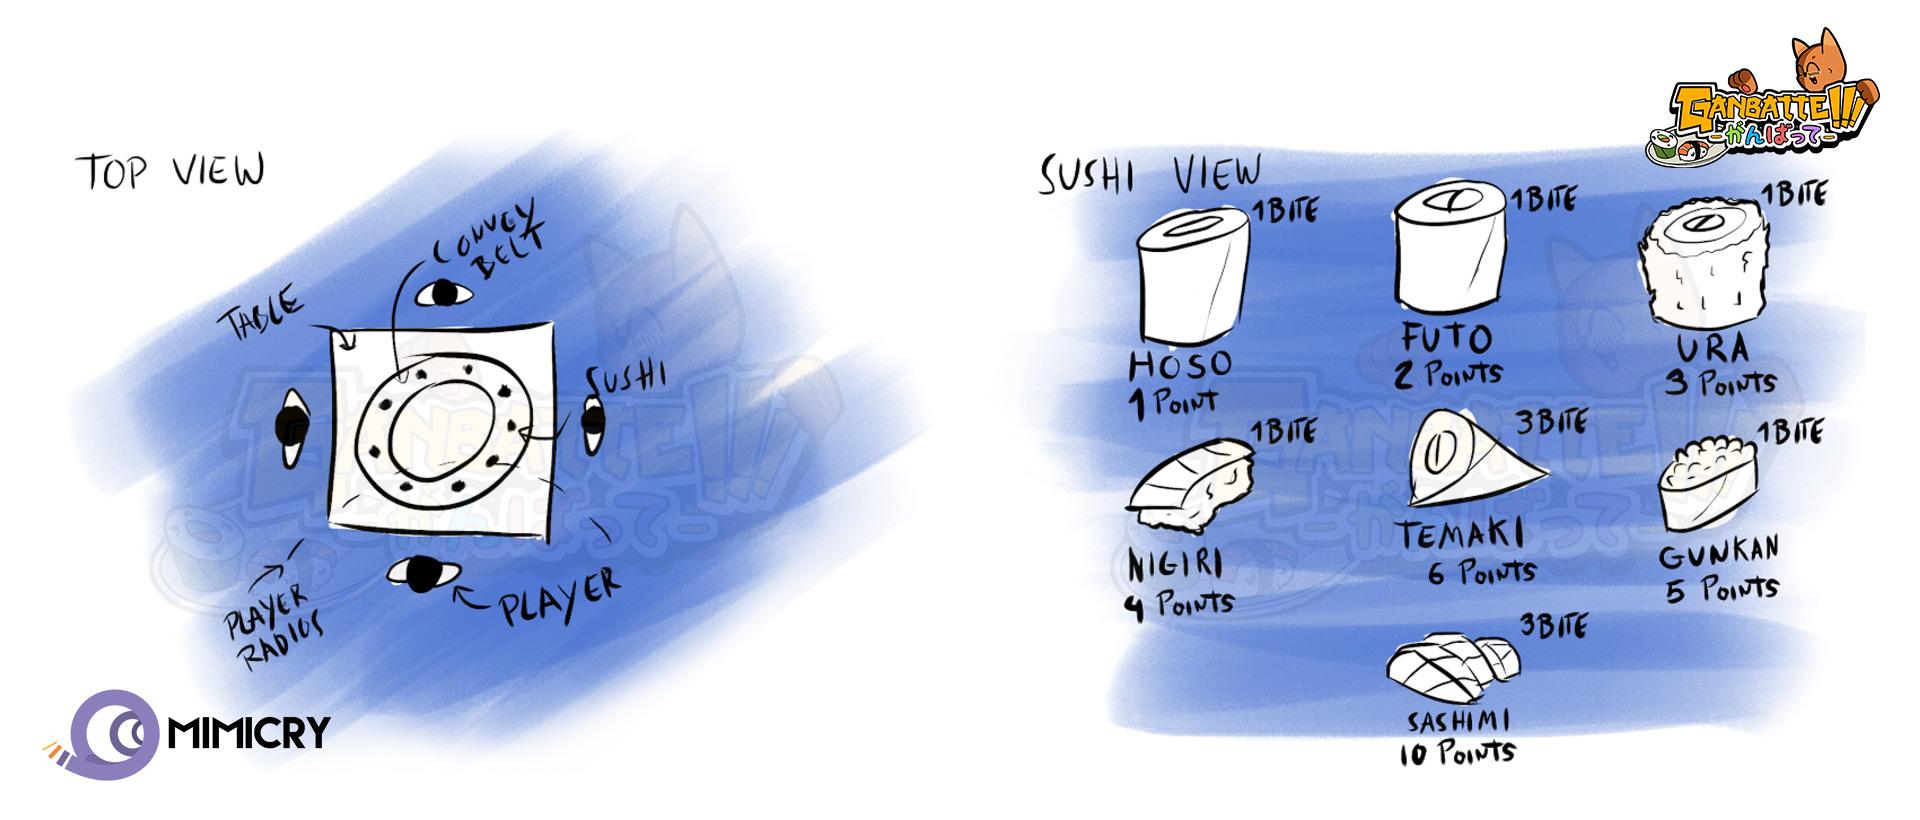 Ganbatte main game concept sketches